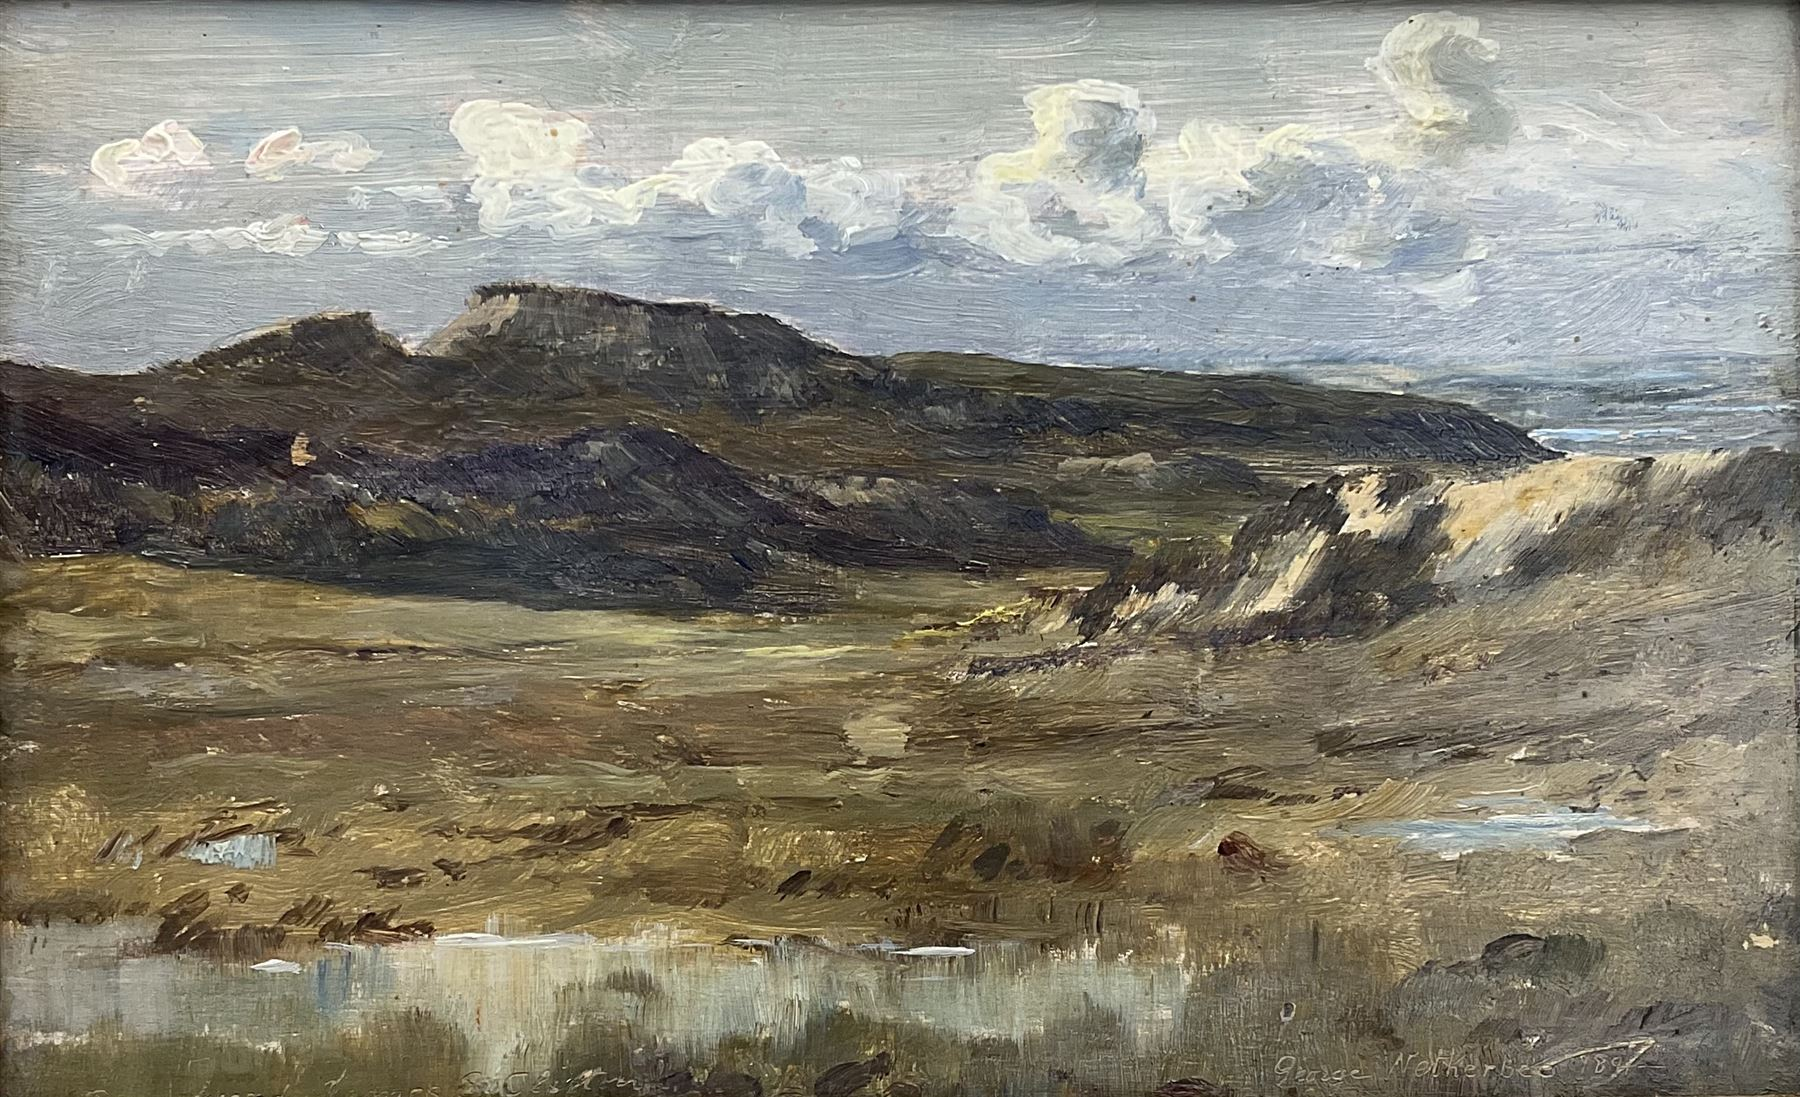 George Faulkner Wetherbee RI ROI (American 1851-1920): Upland Landscape